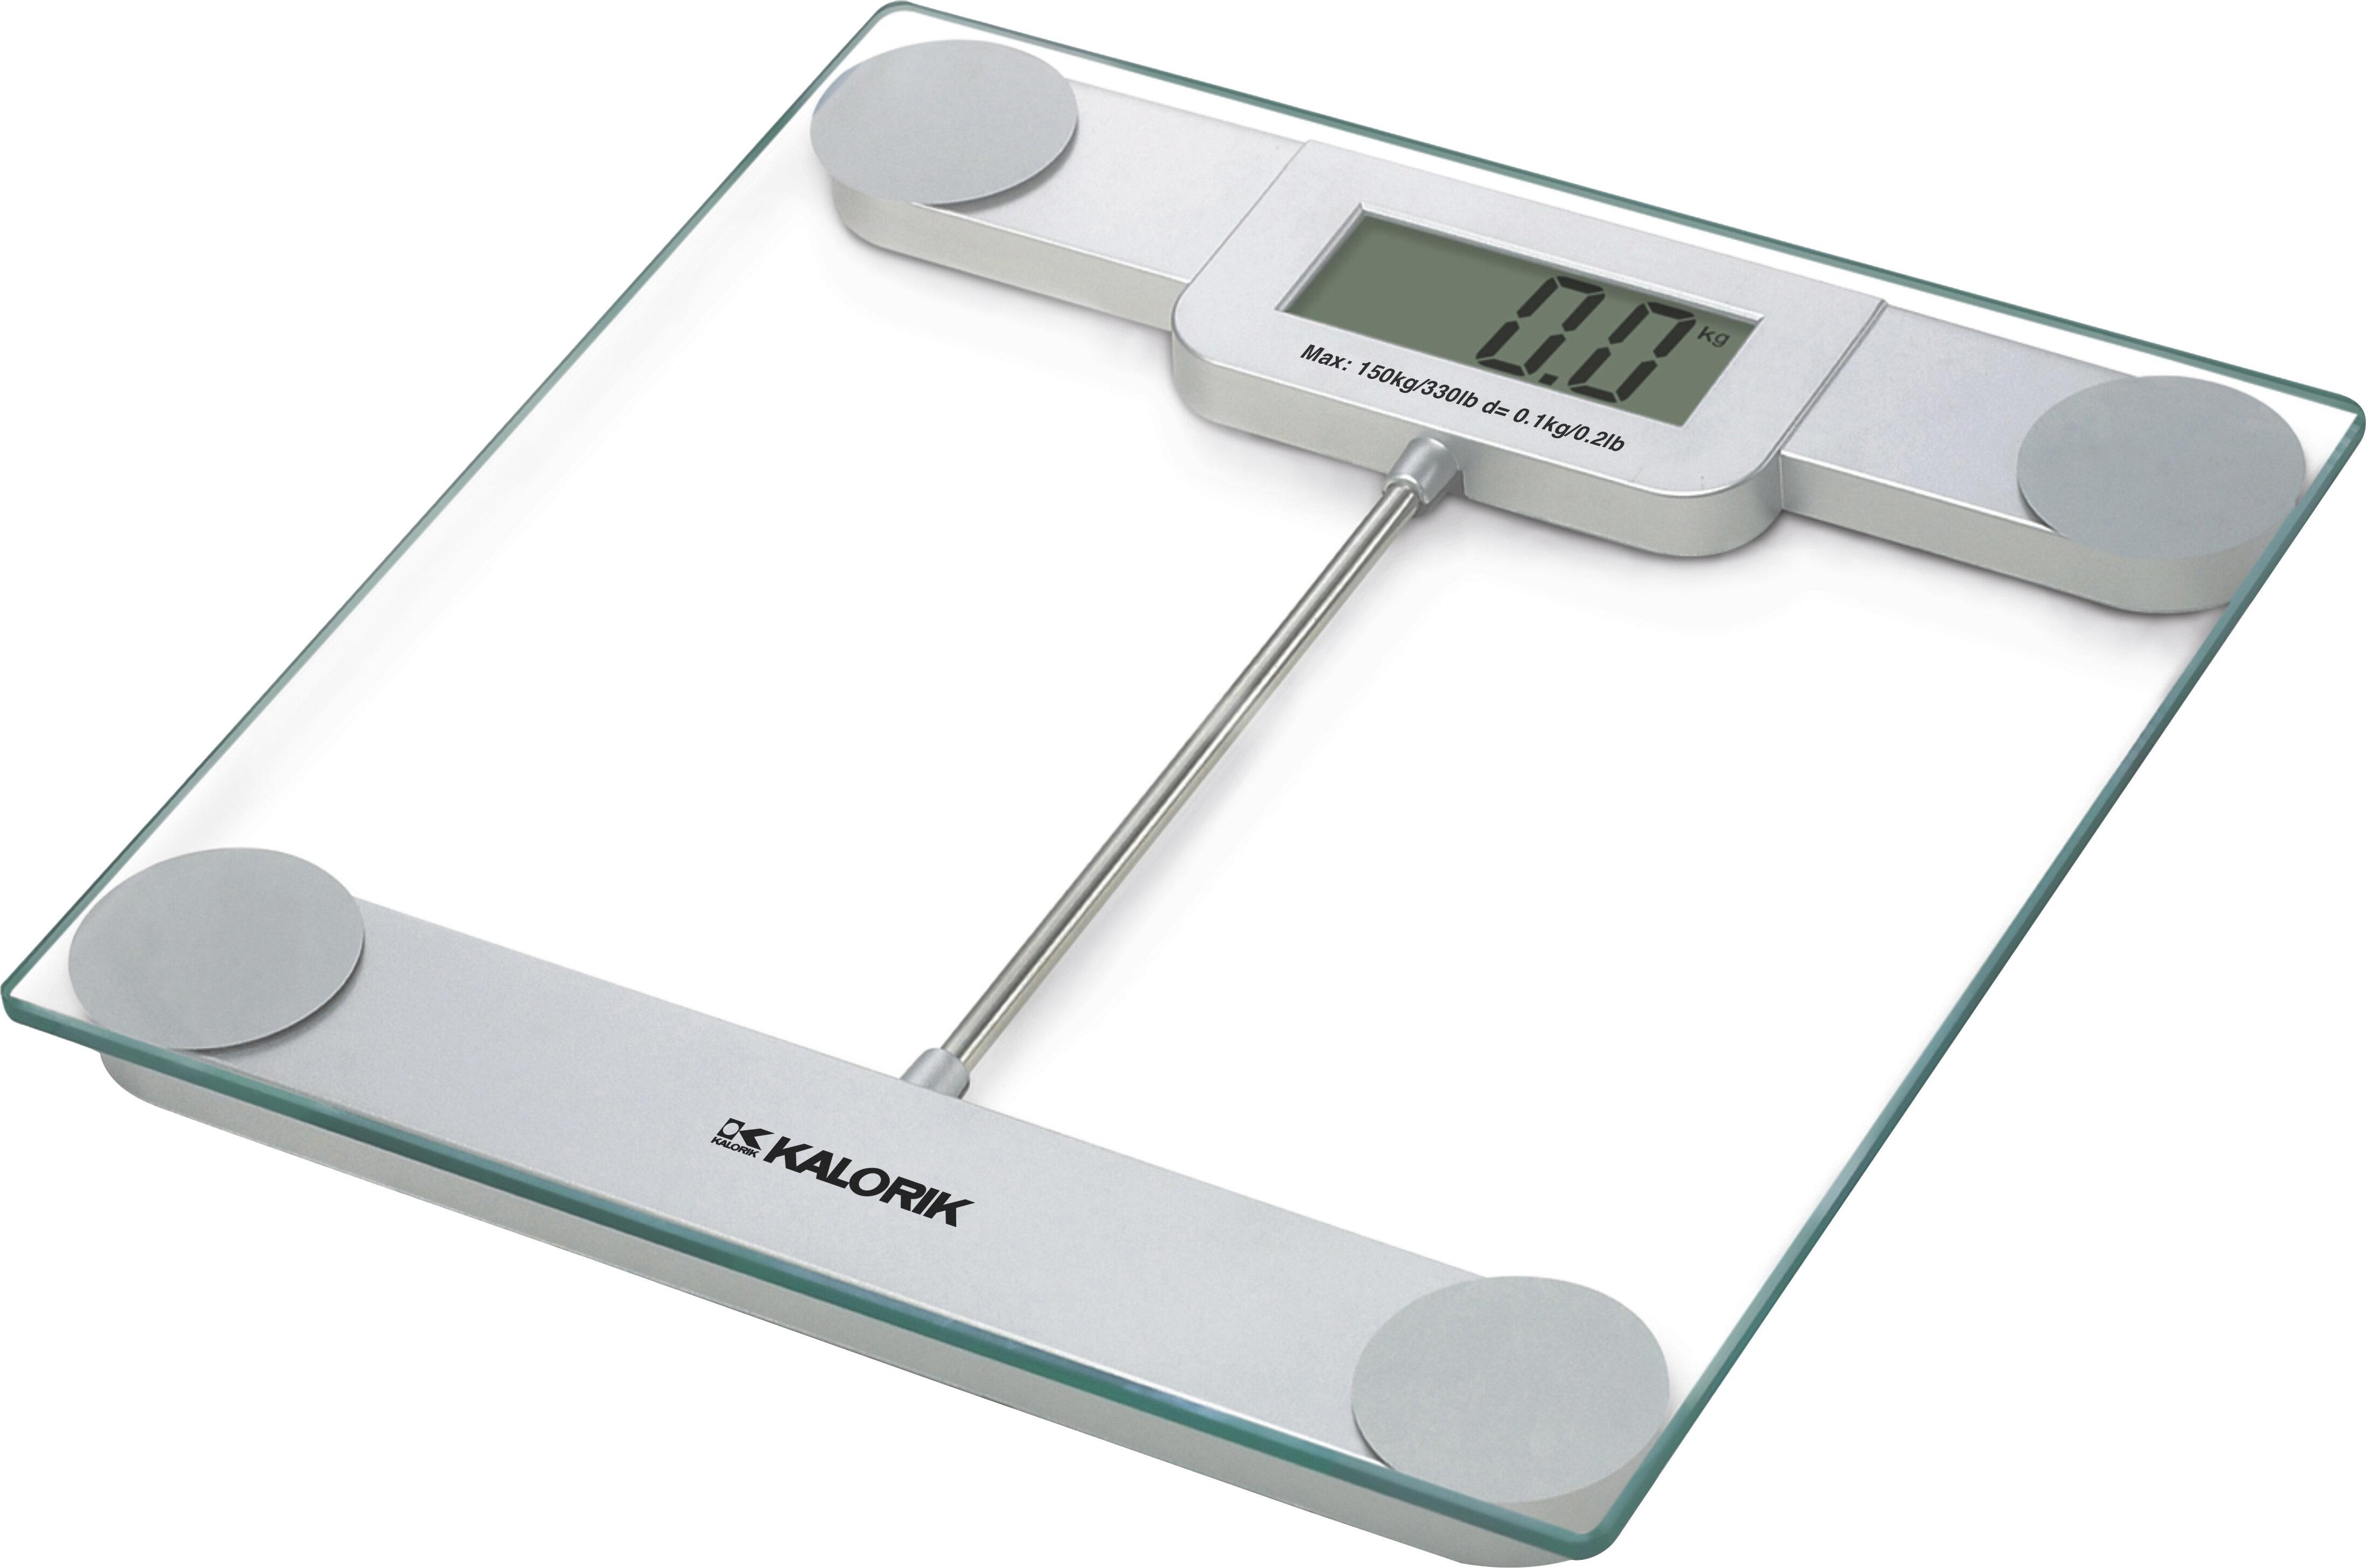 Kalorik Precision Digital Gl